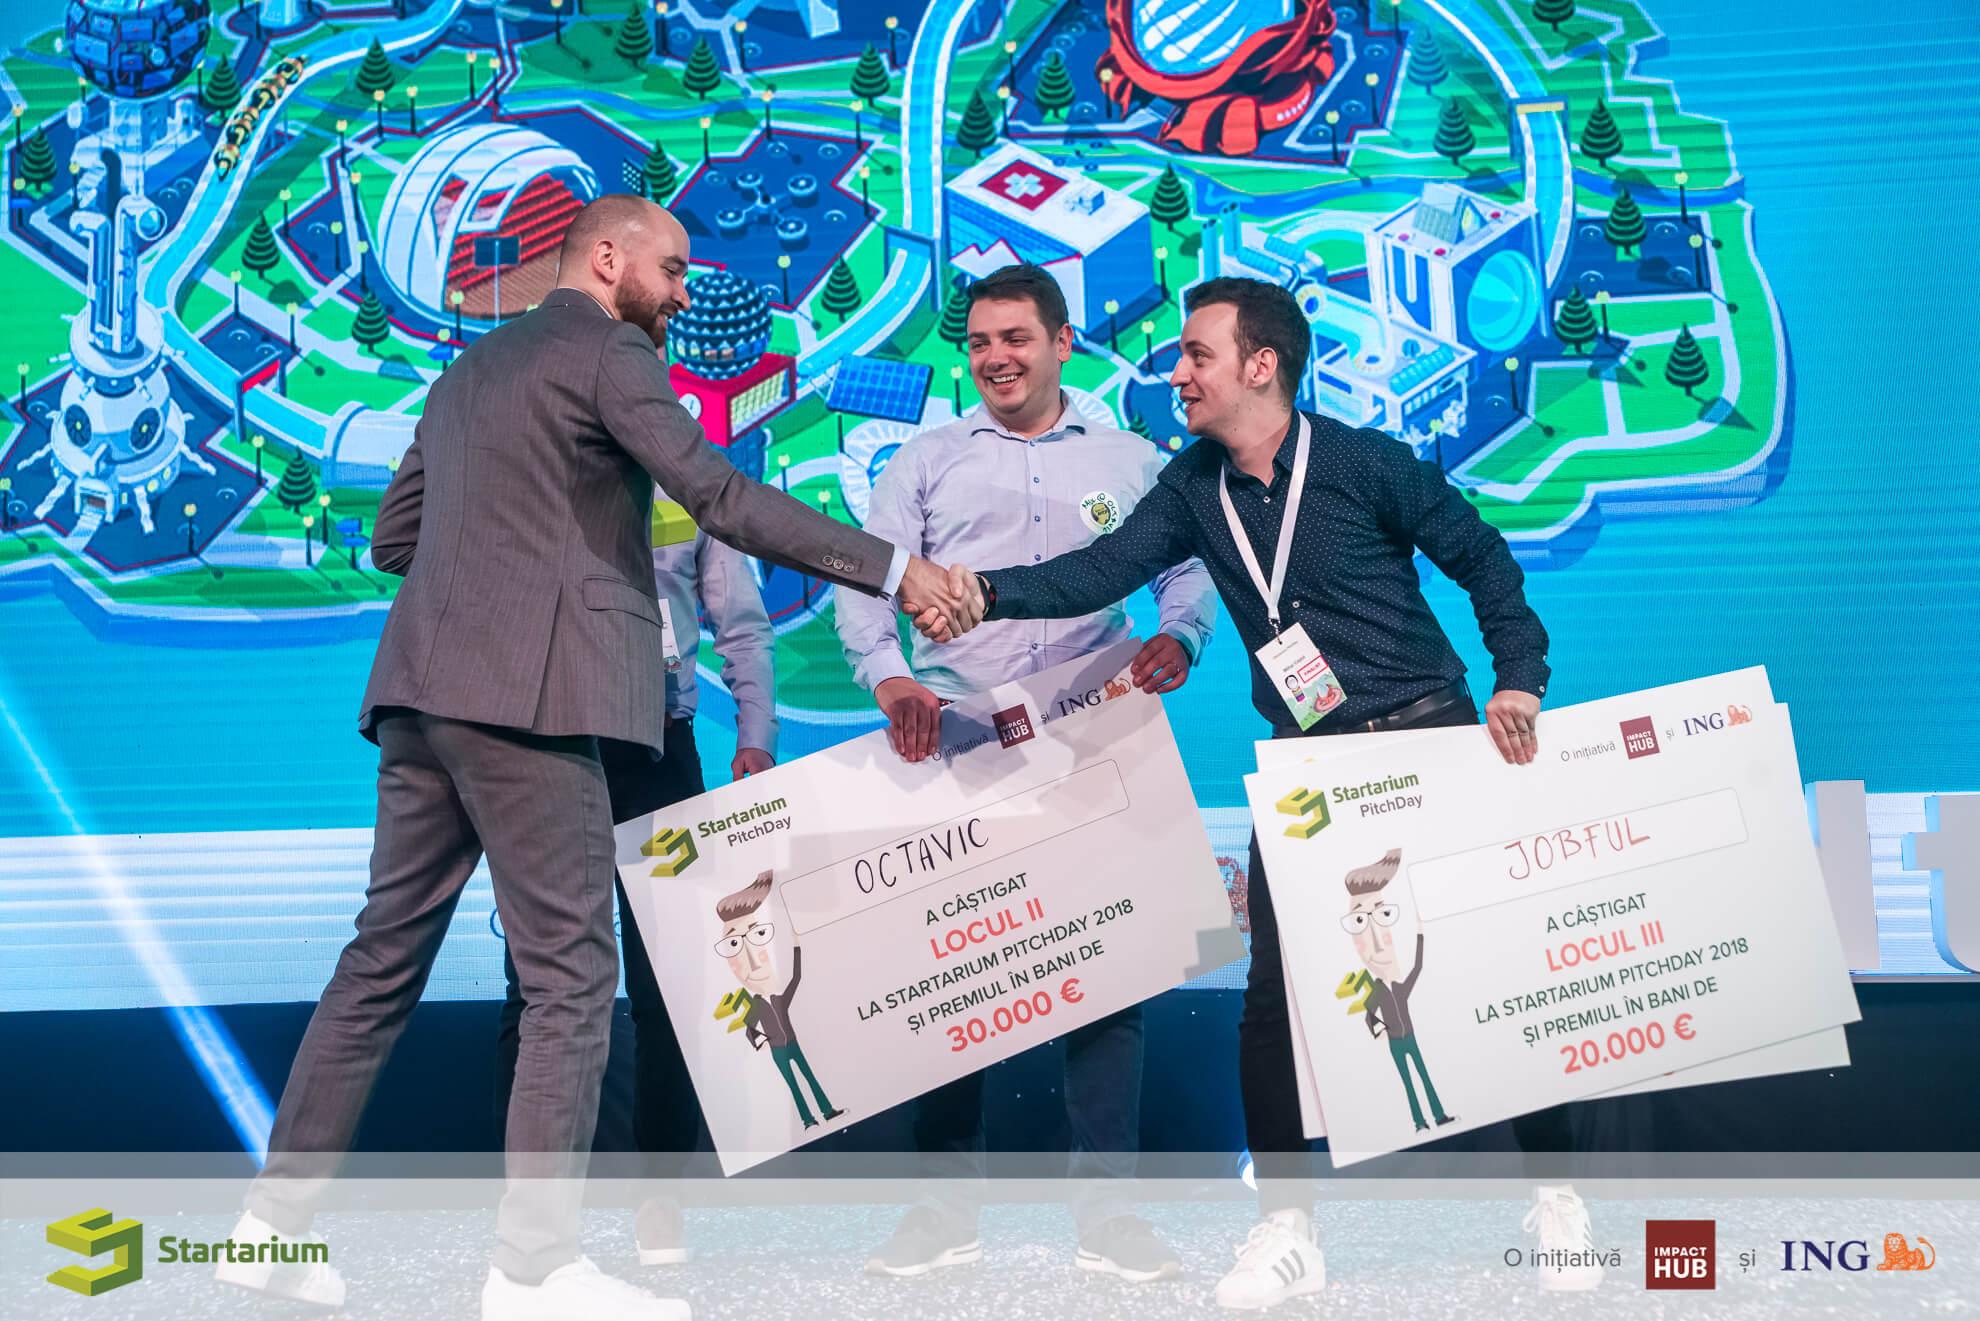 Premiul 1 - iTux | Premiul 2 - Octavic | Premiul 3 - Jobful | Premiul de popularitate - Jobful